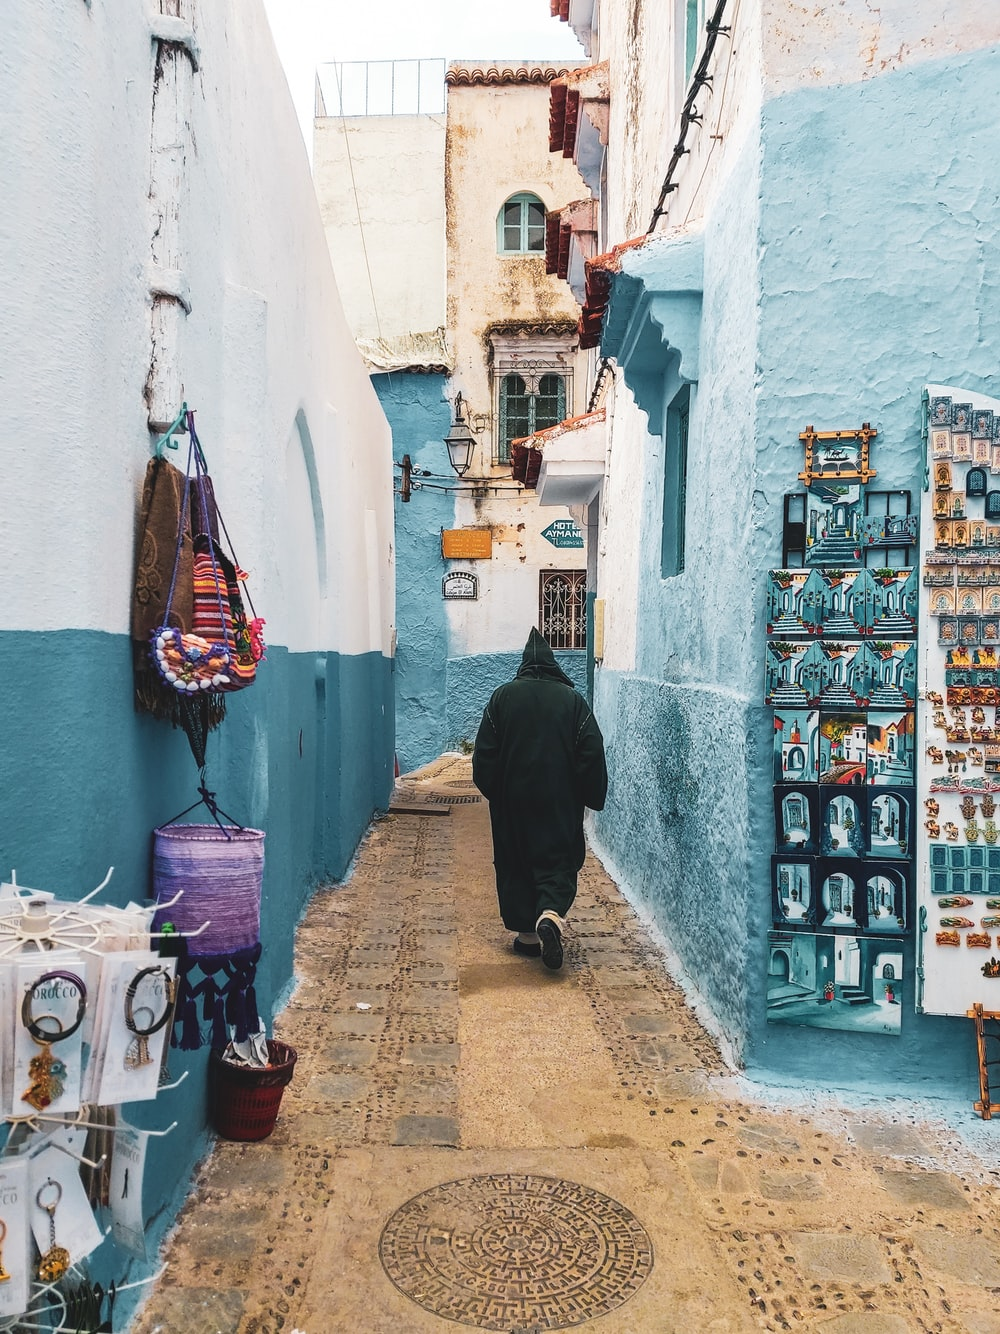 person wearing hooded jacket walking on alley between buildings during daytime